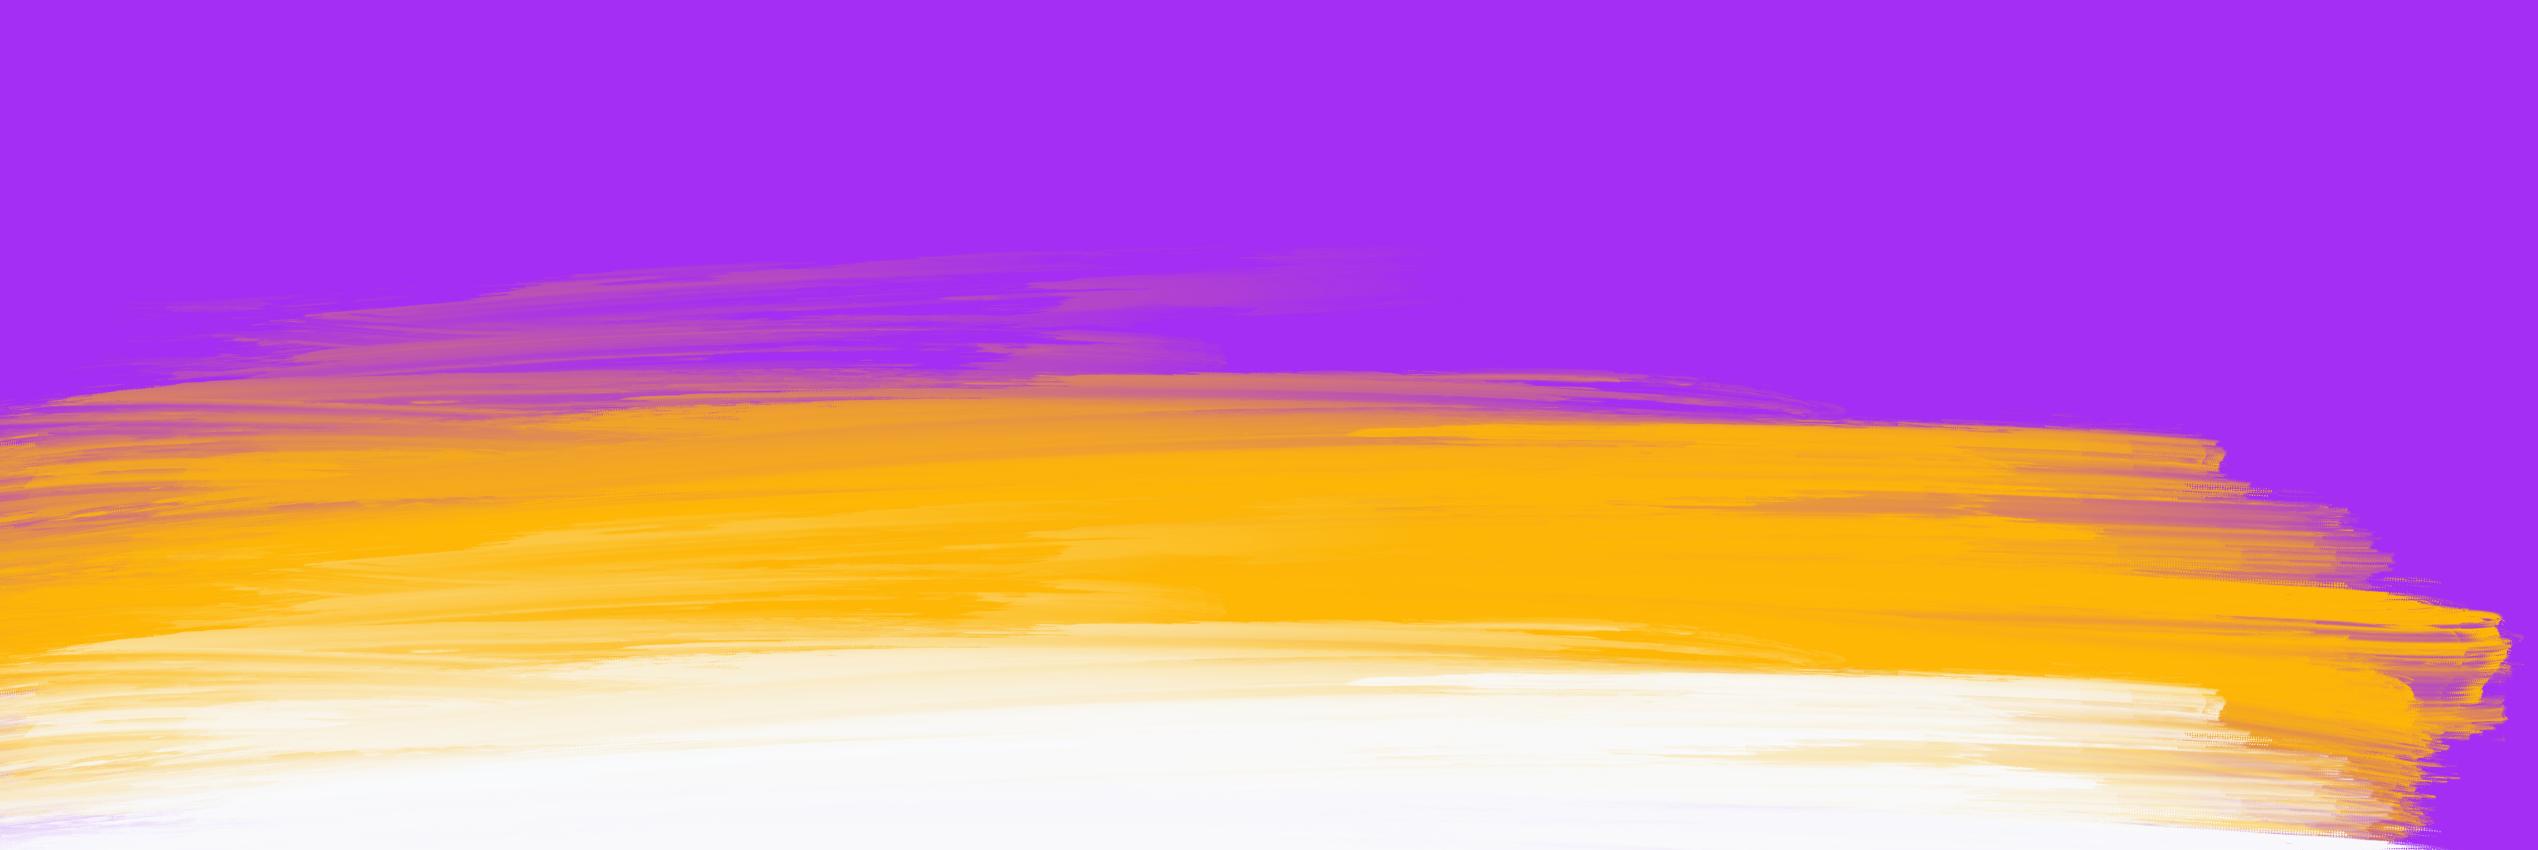 Untitled_Artwork-3